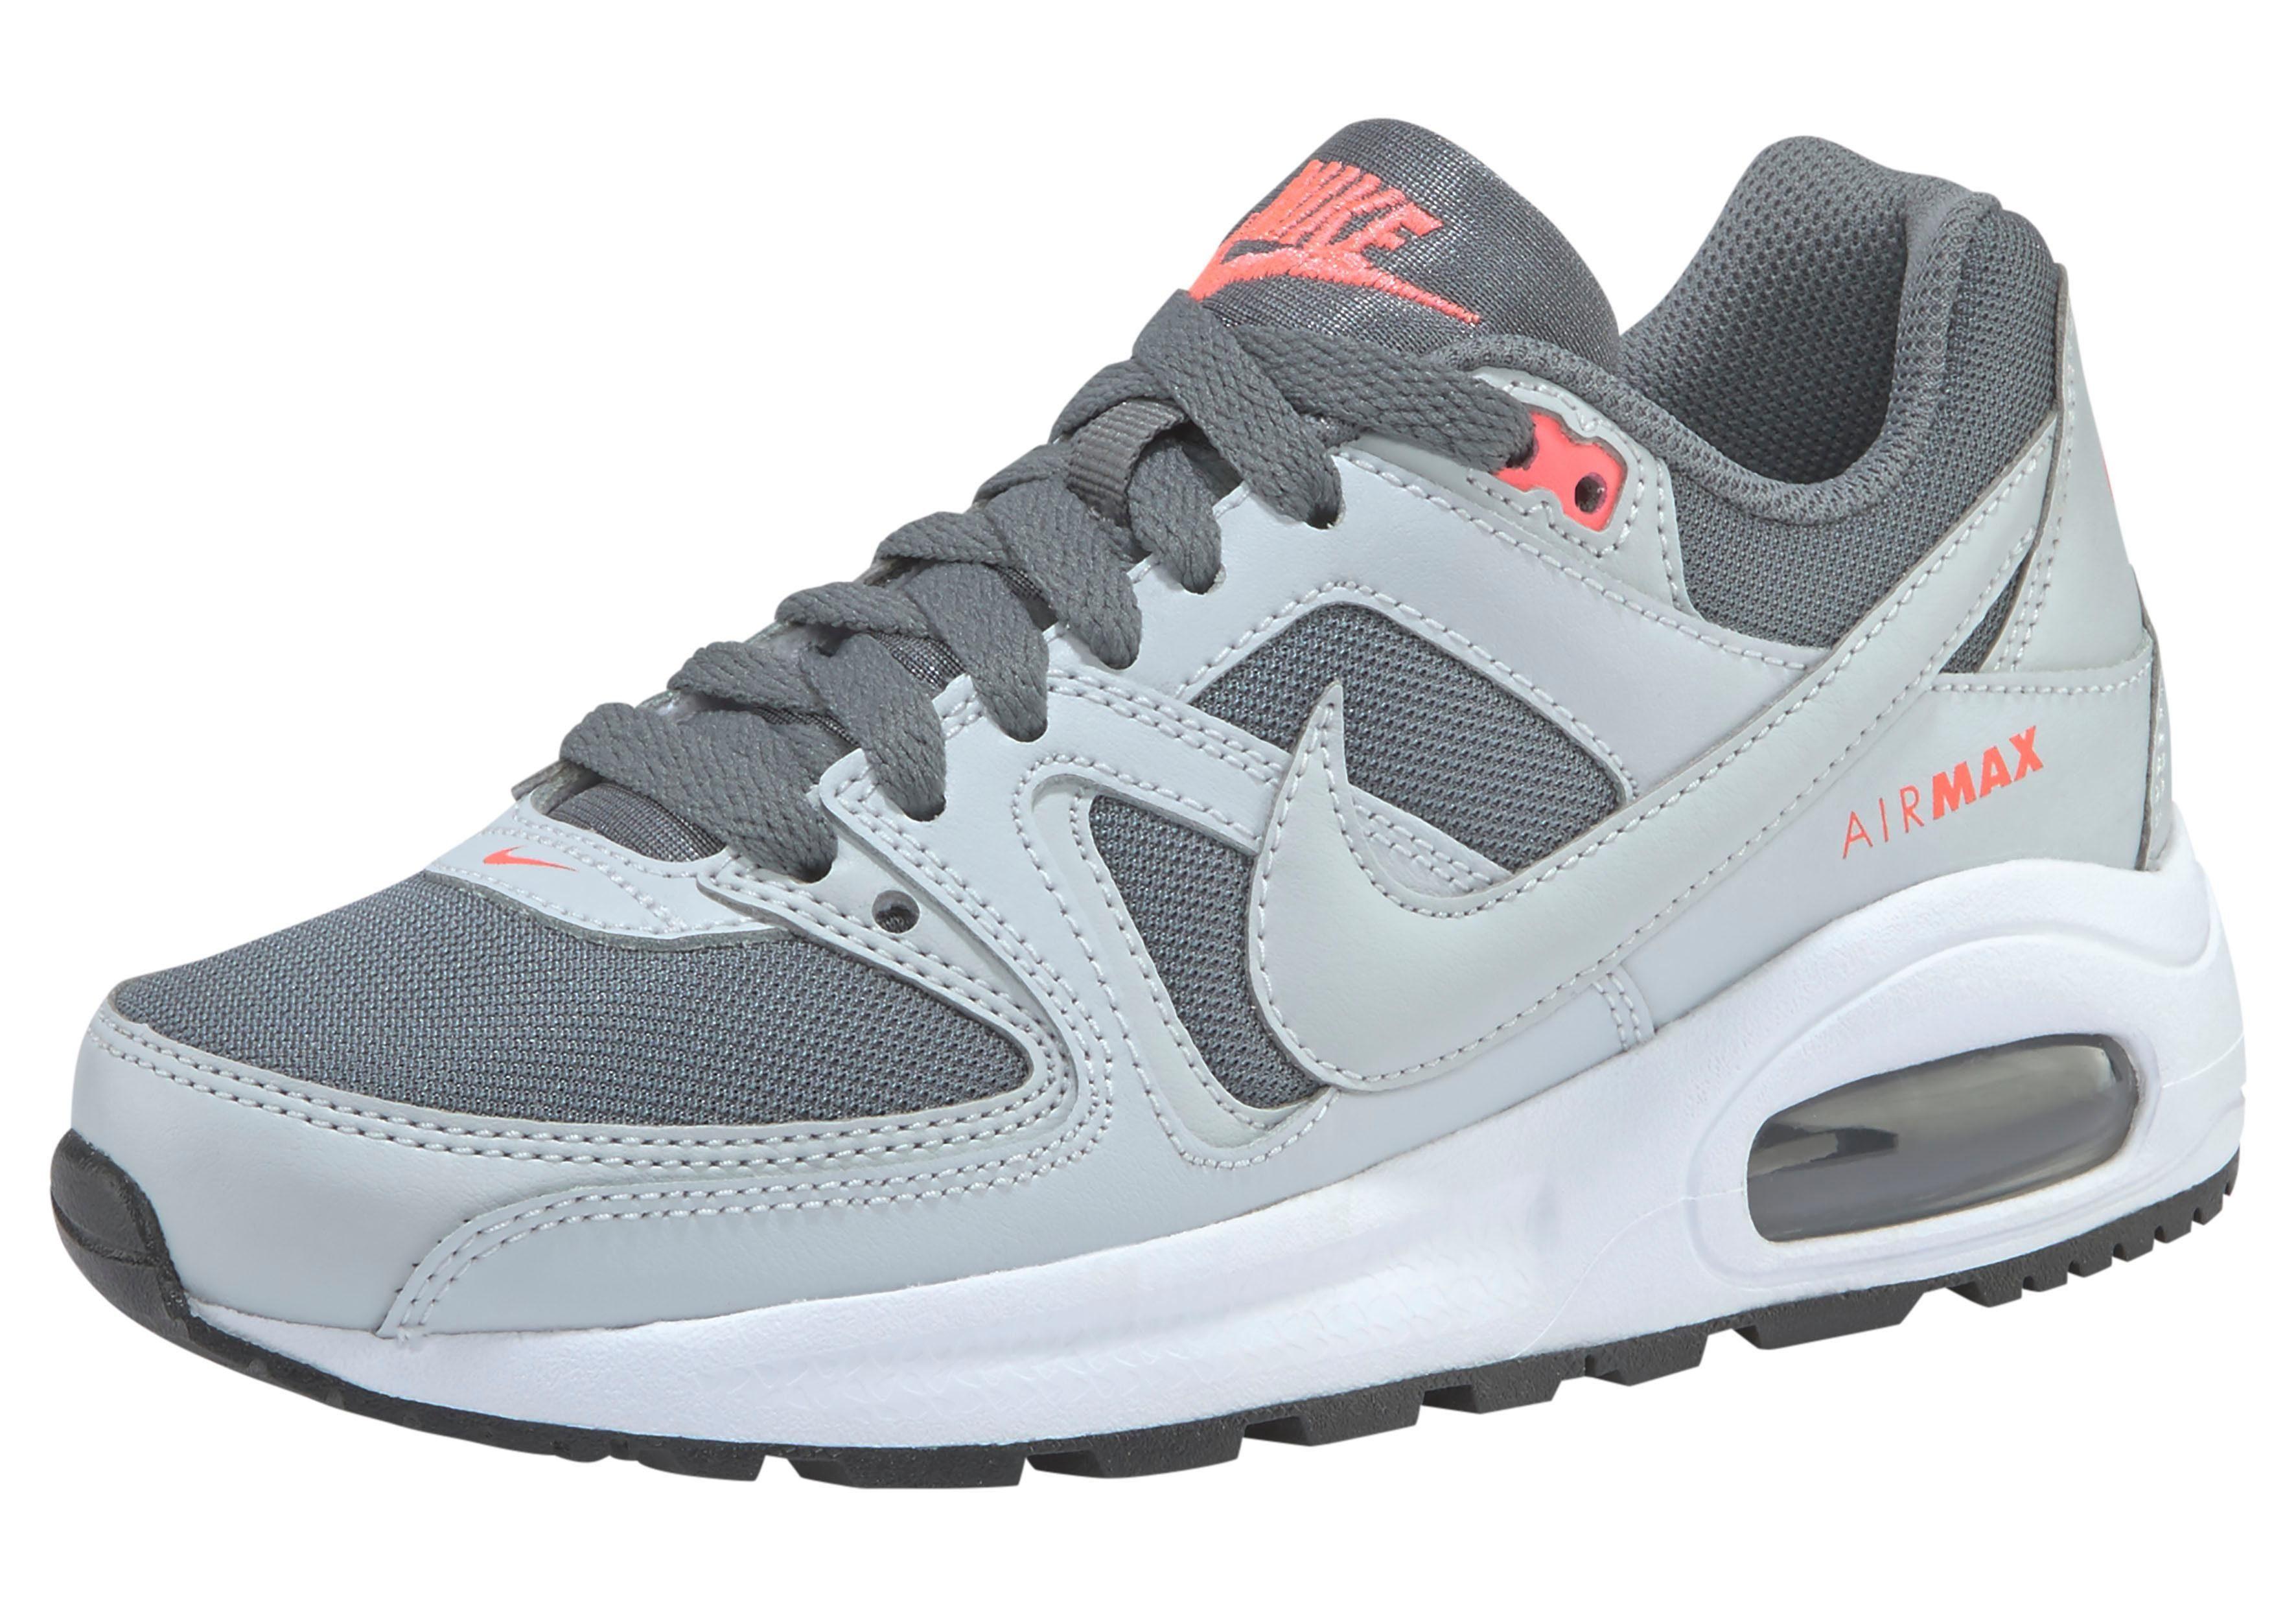 Komfortabel Nike Air Max Command Leather Schuhe grau Frauen